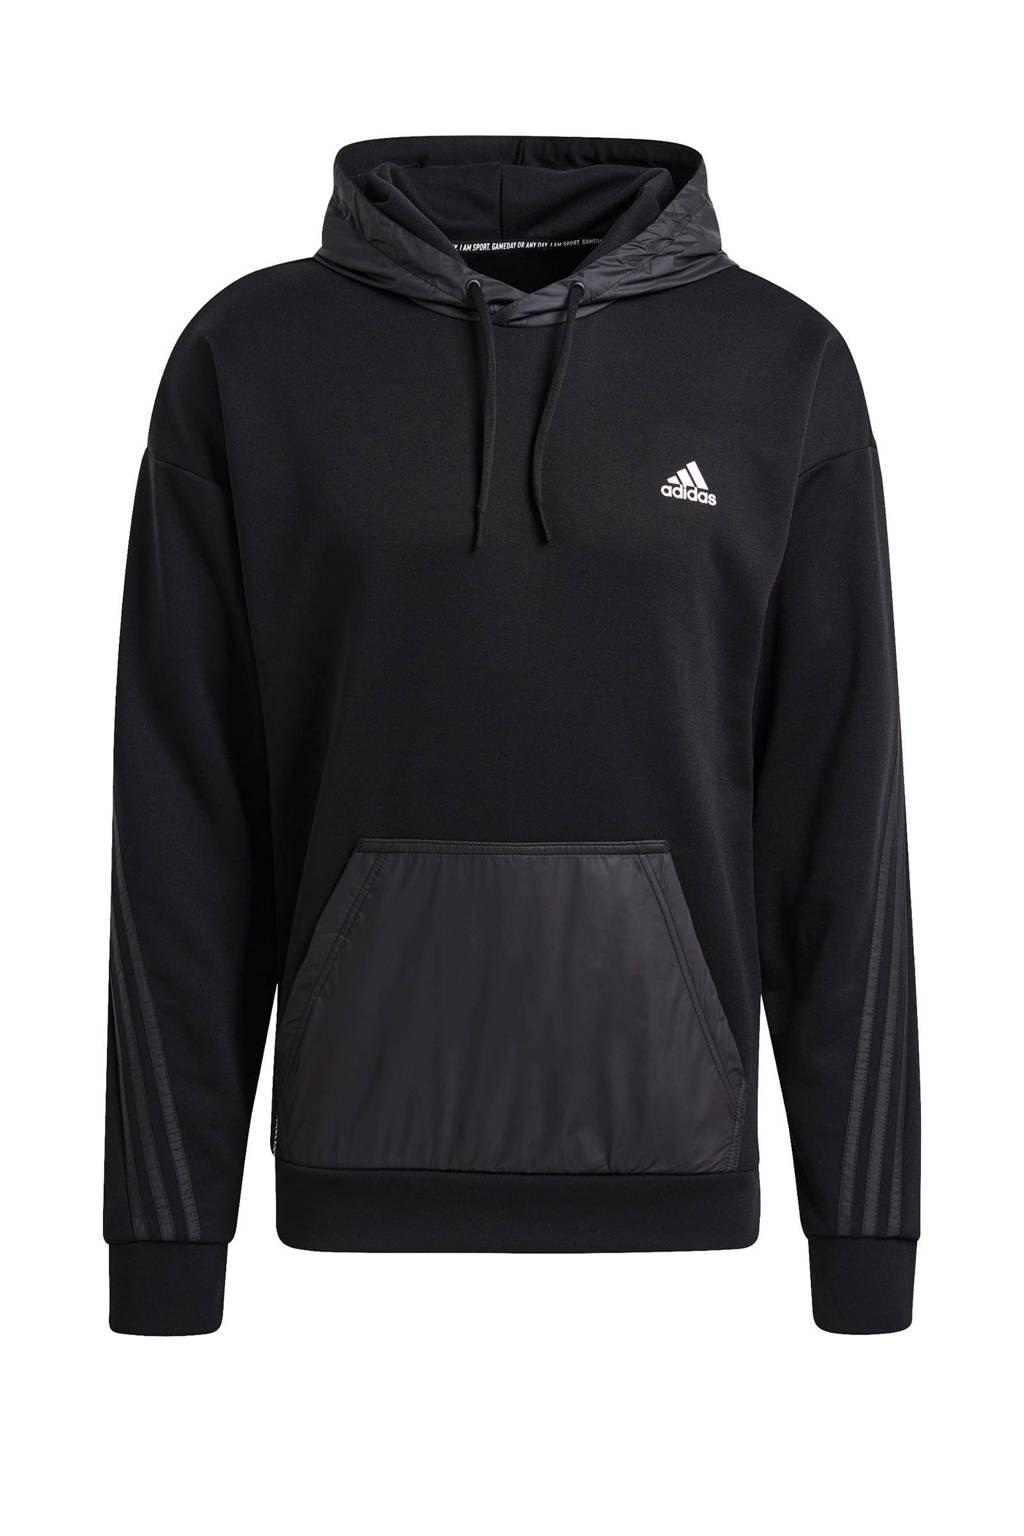 adidas Performance   sporthoodie zwart, Zwart